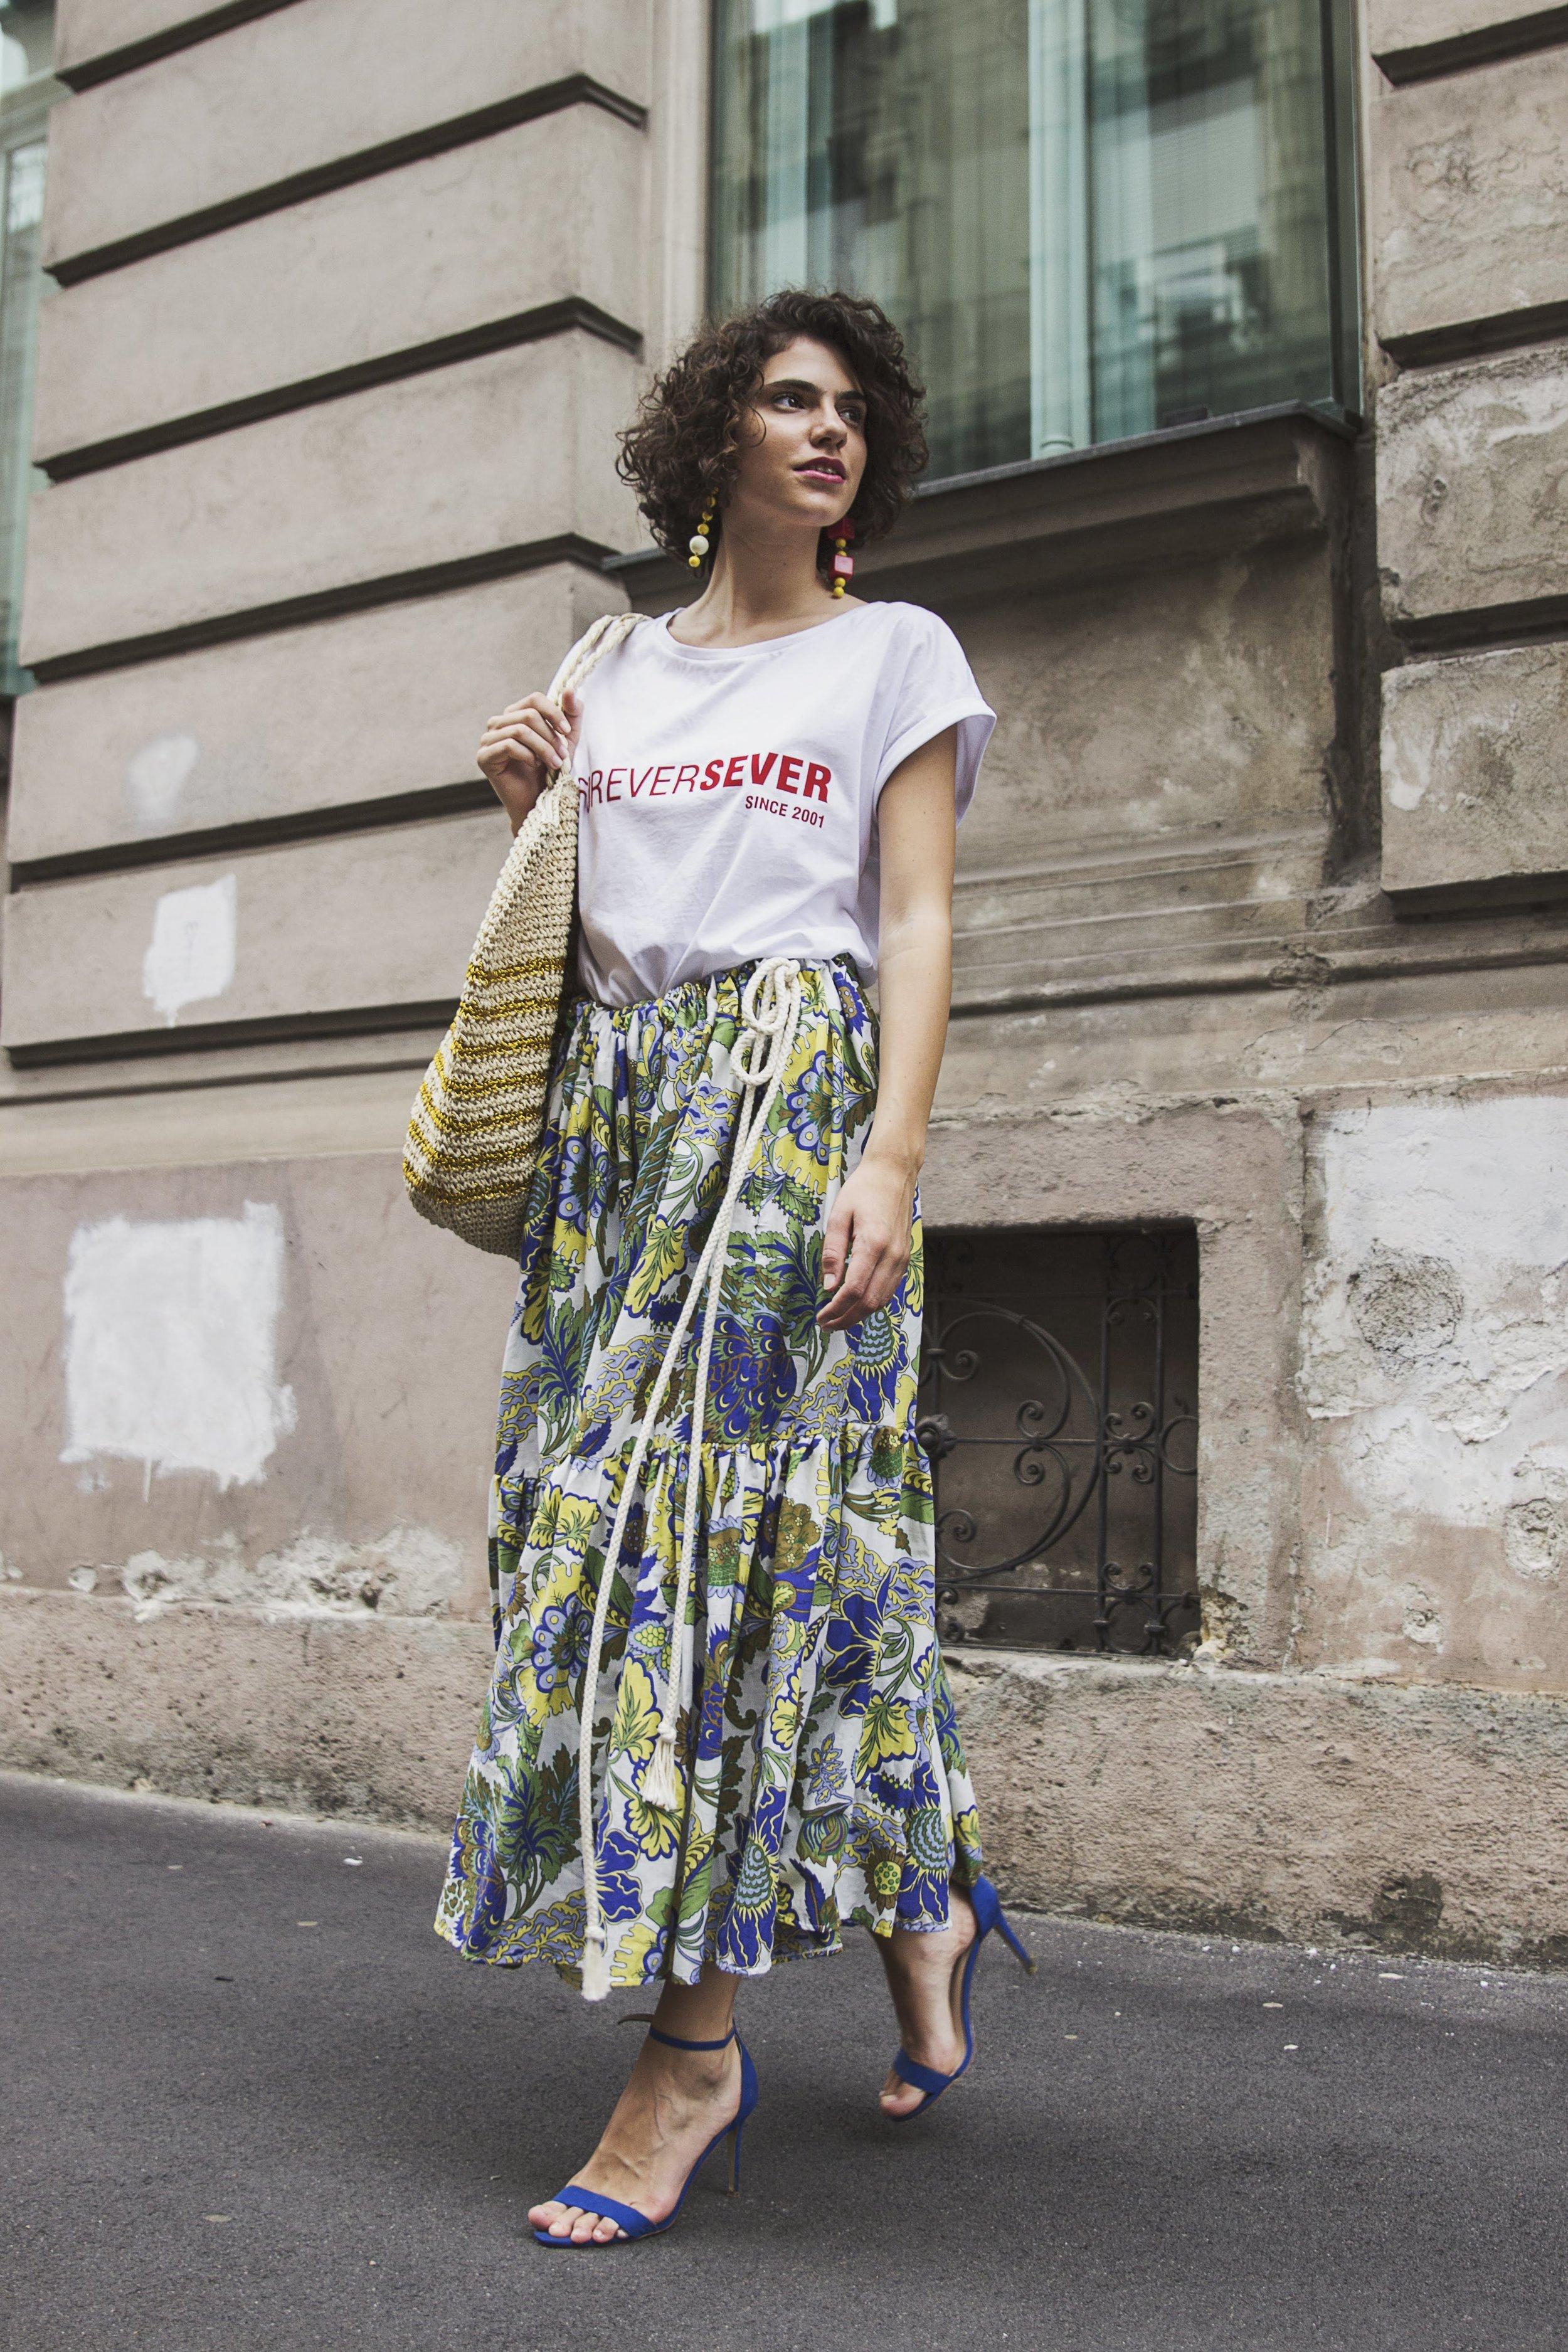 luka-lajic-fashion-photography-robert-sever-dizajner-croatian (3).jpg